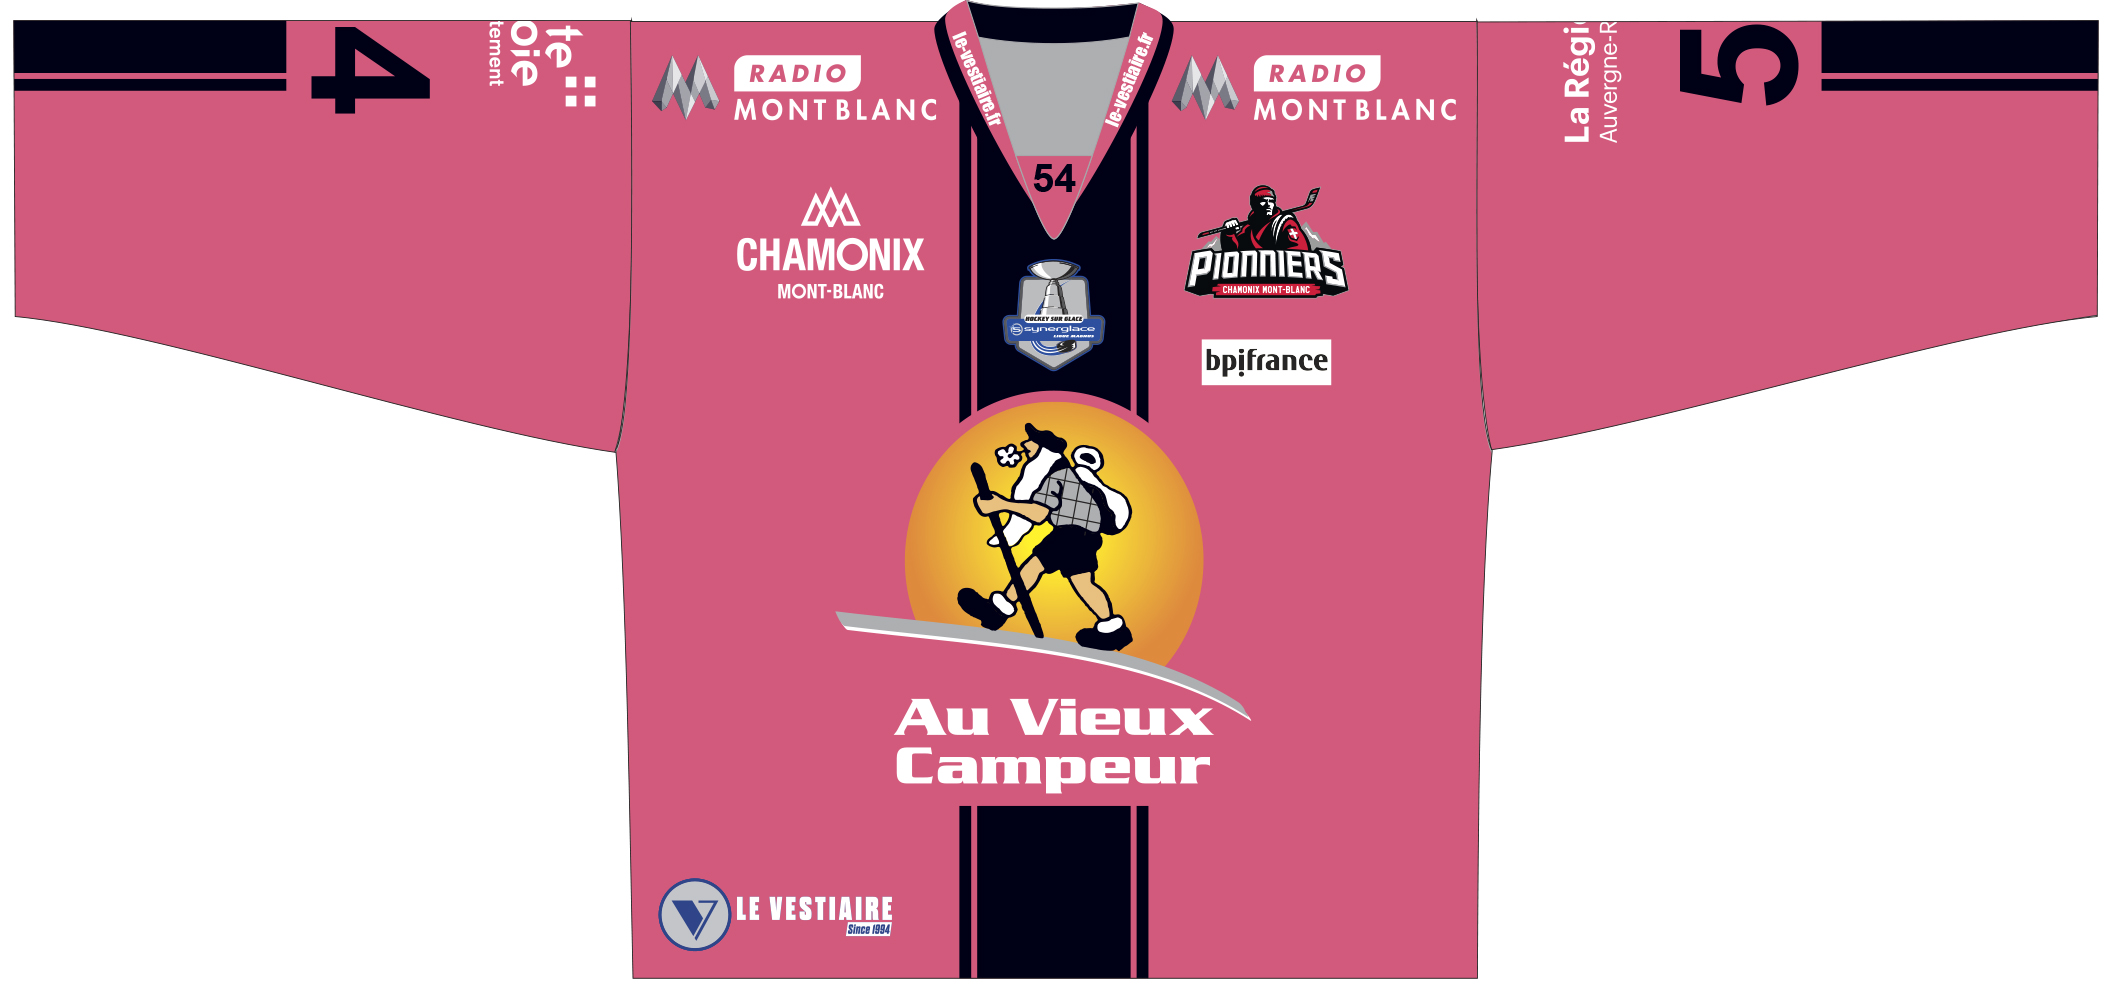 Chamonix S Associe A Octobre Rose Chamonix Hockey Elite